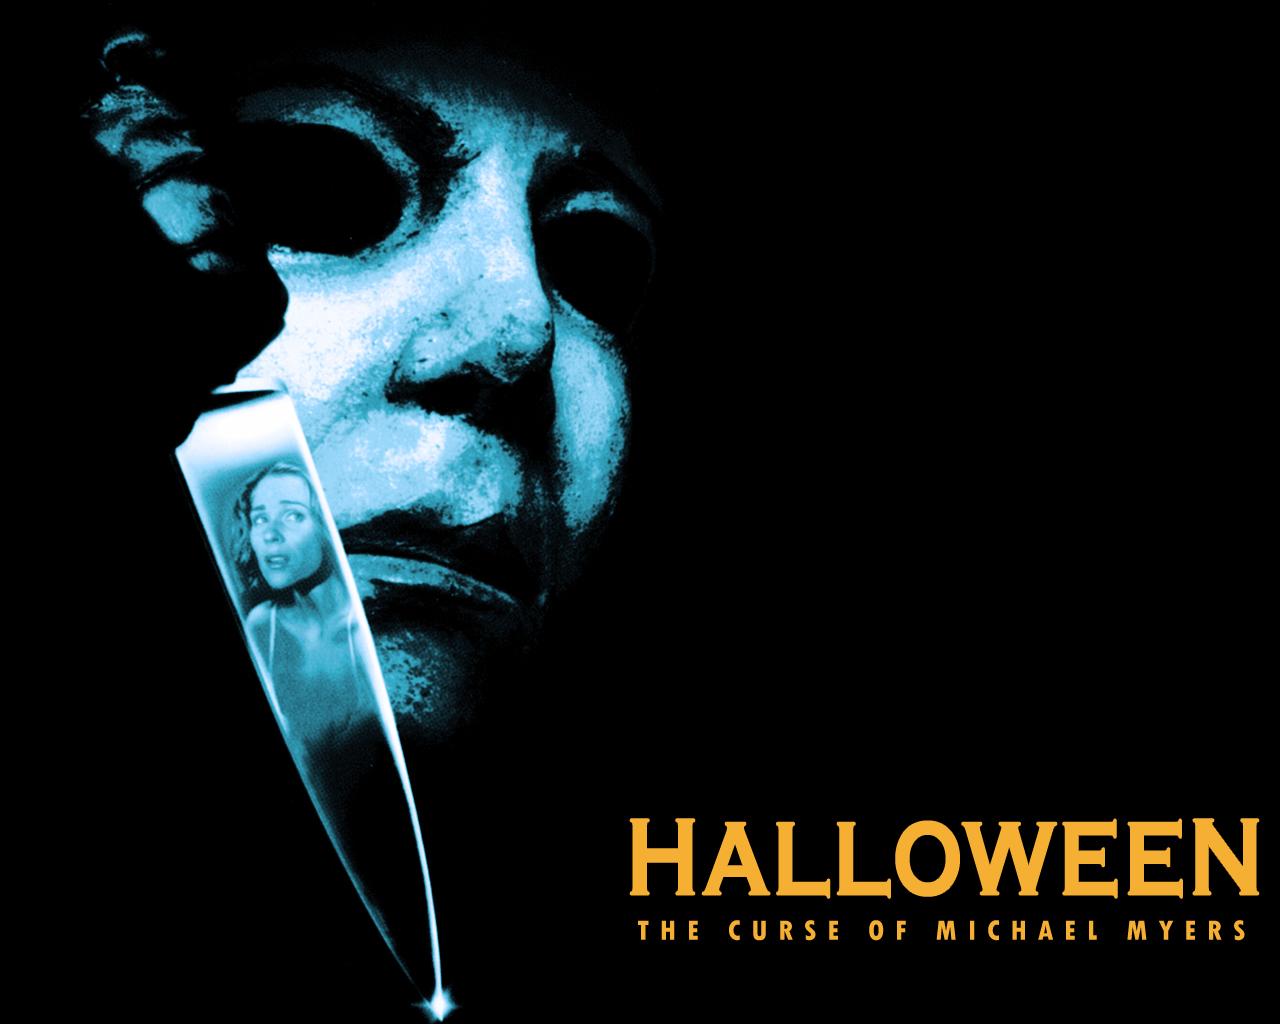 poster rezolutie mare halloween 6 the curse of michael